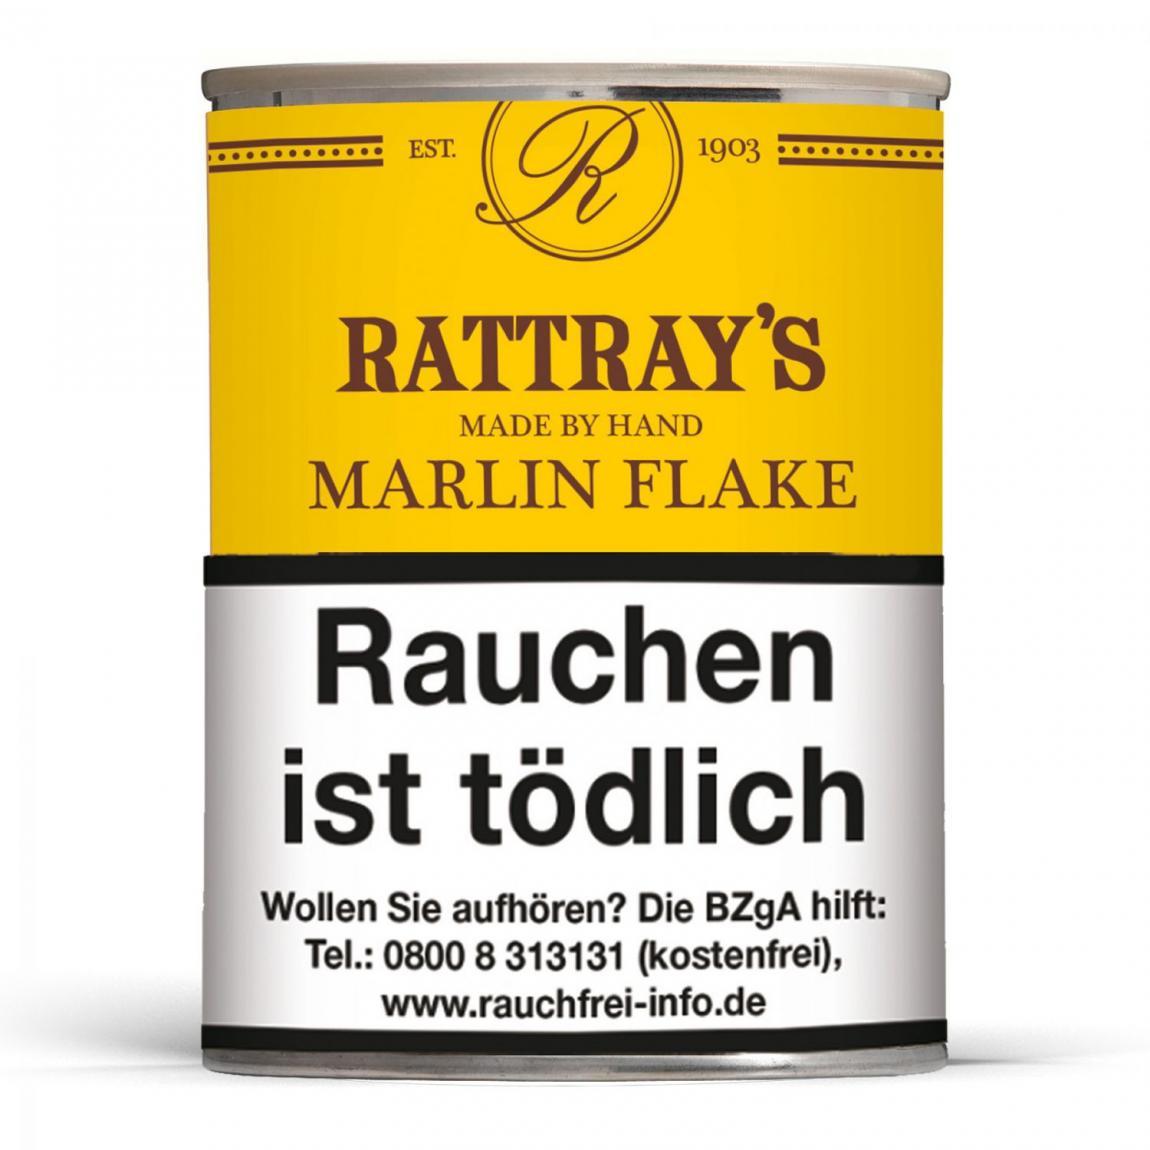 Rattray's Marlin Flake 100g Dose